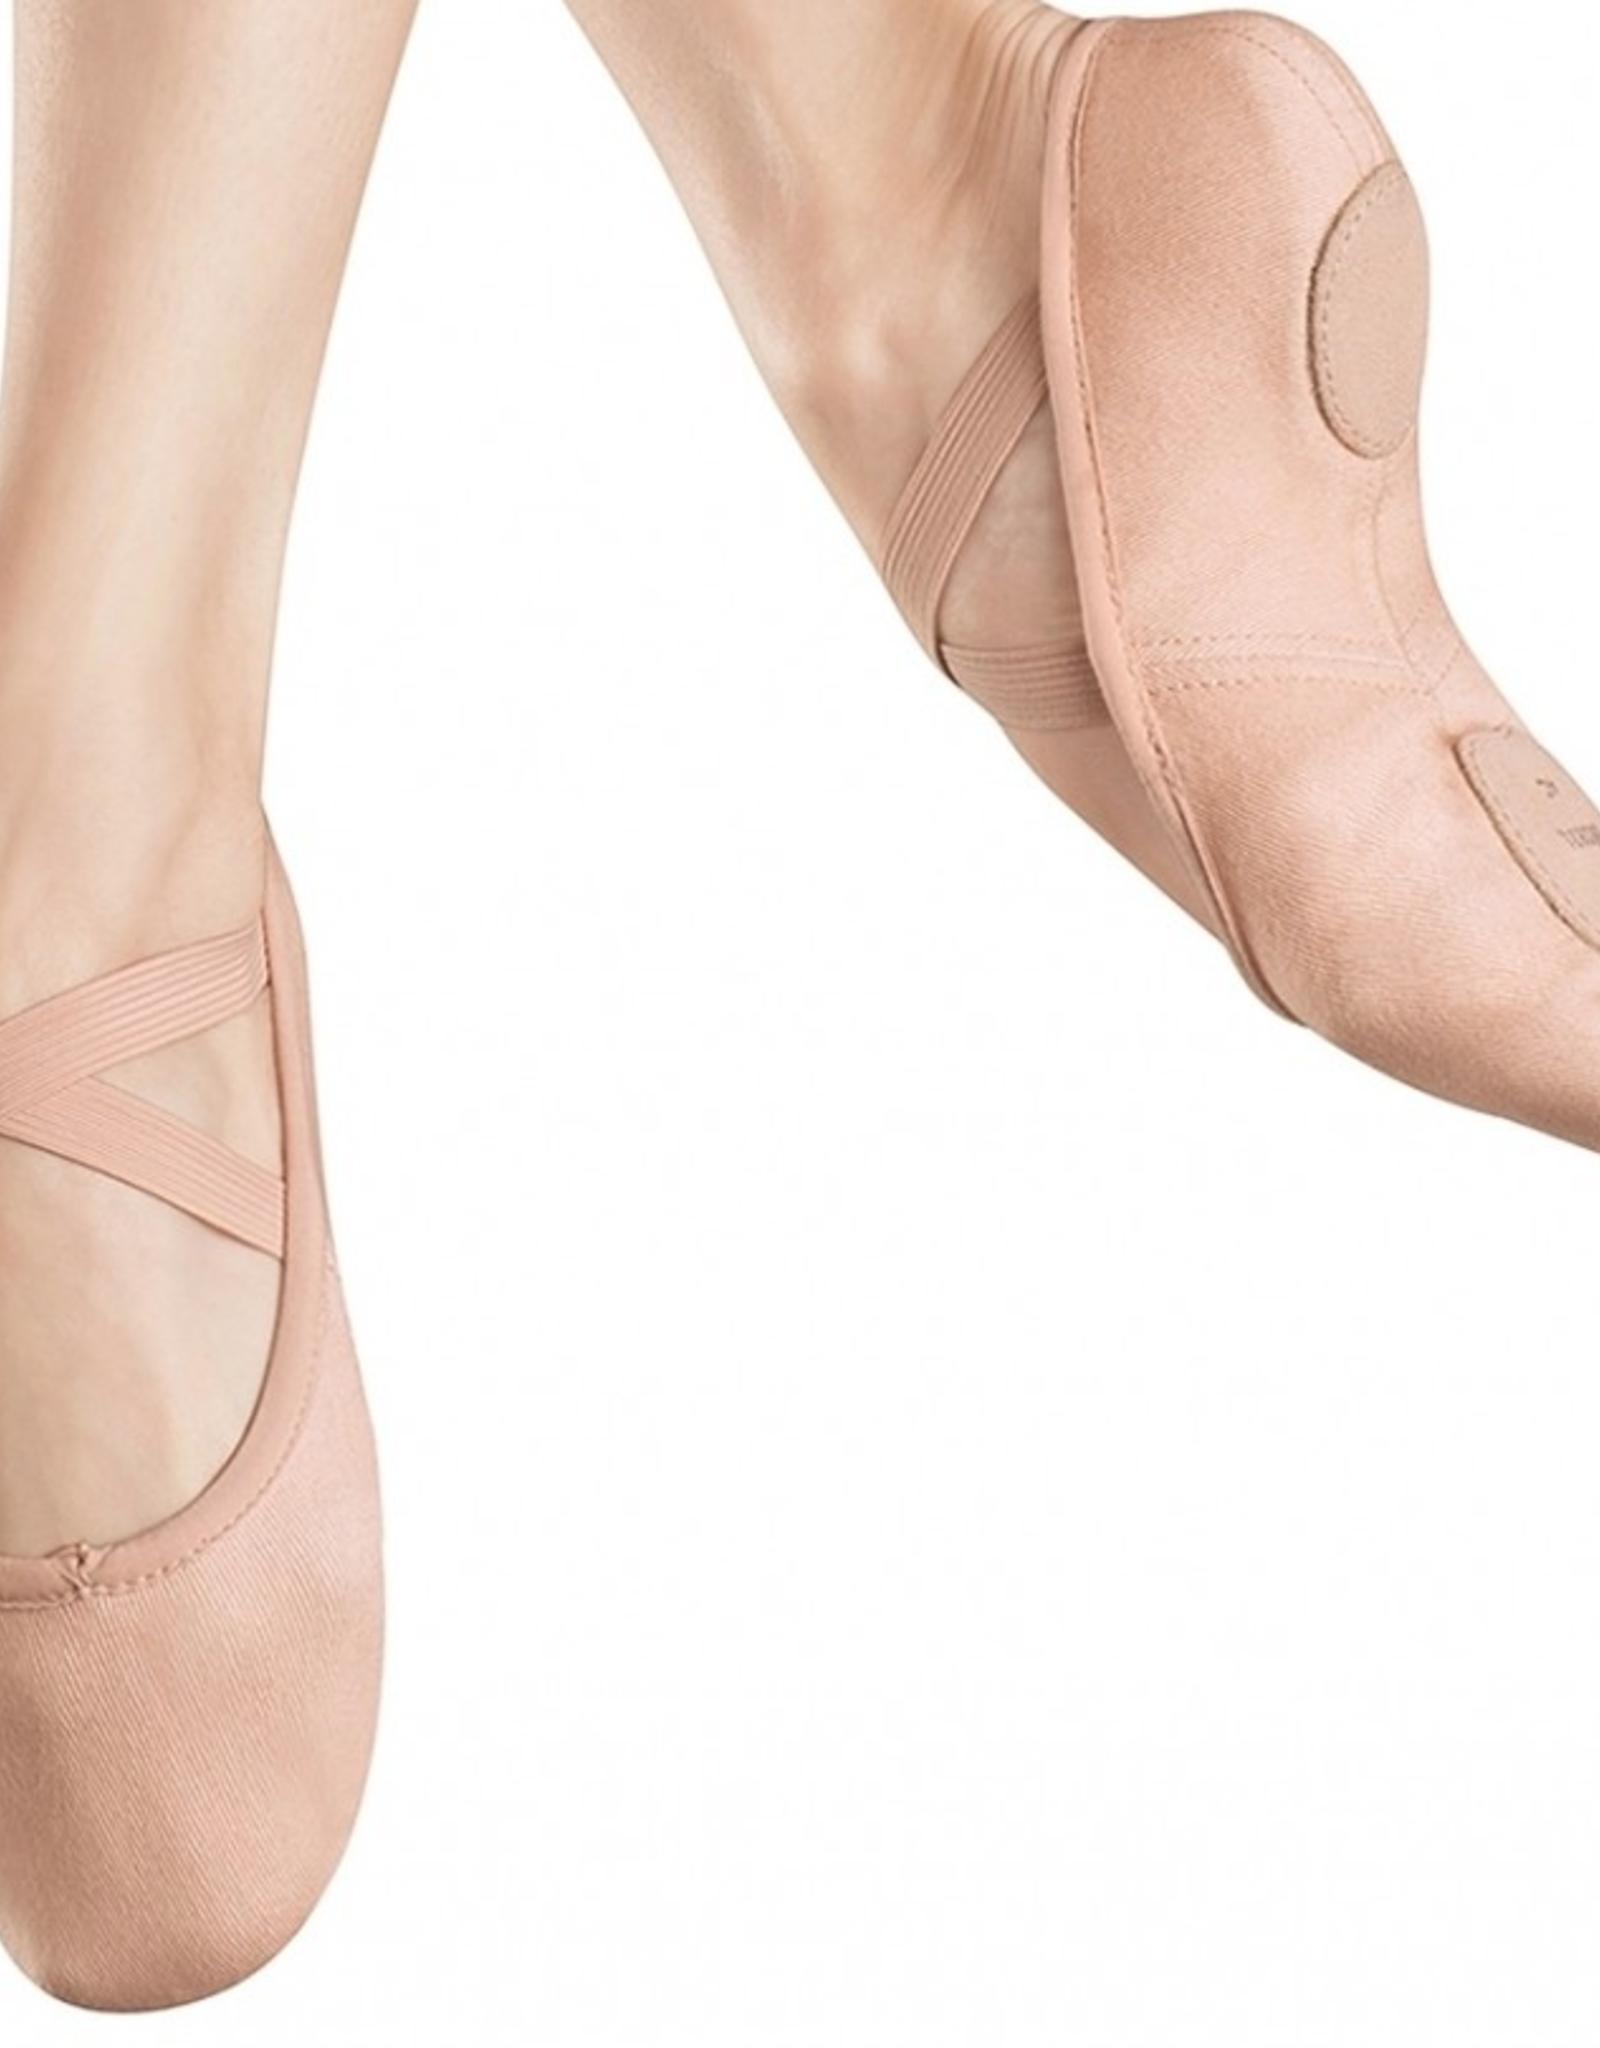 Bloch S0282L Zenith Canvas Split Sole Ballet Slipper Adult